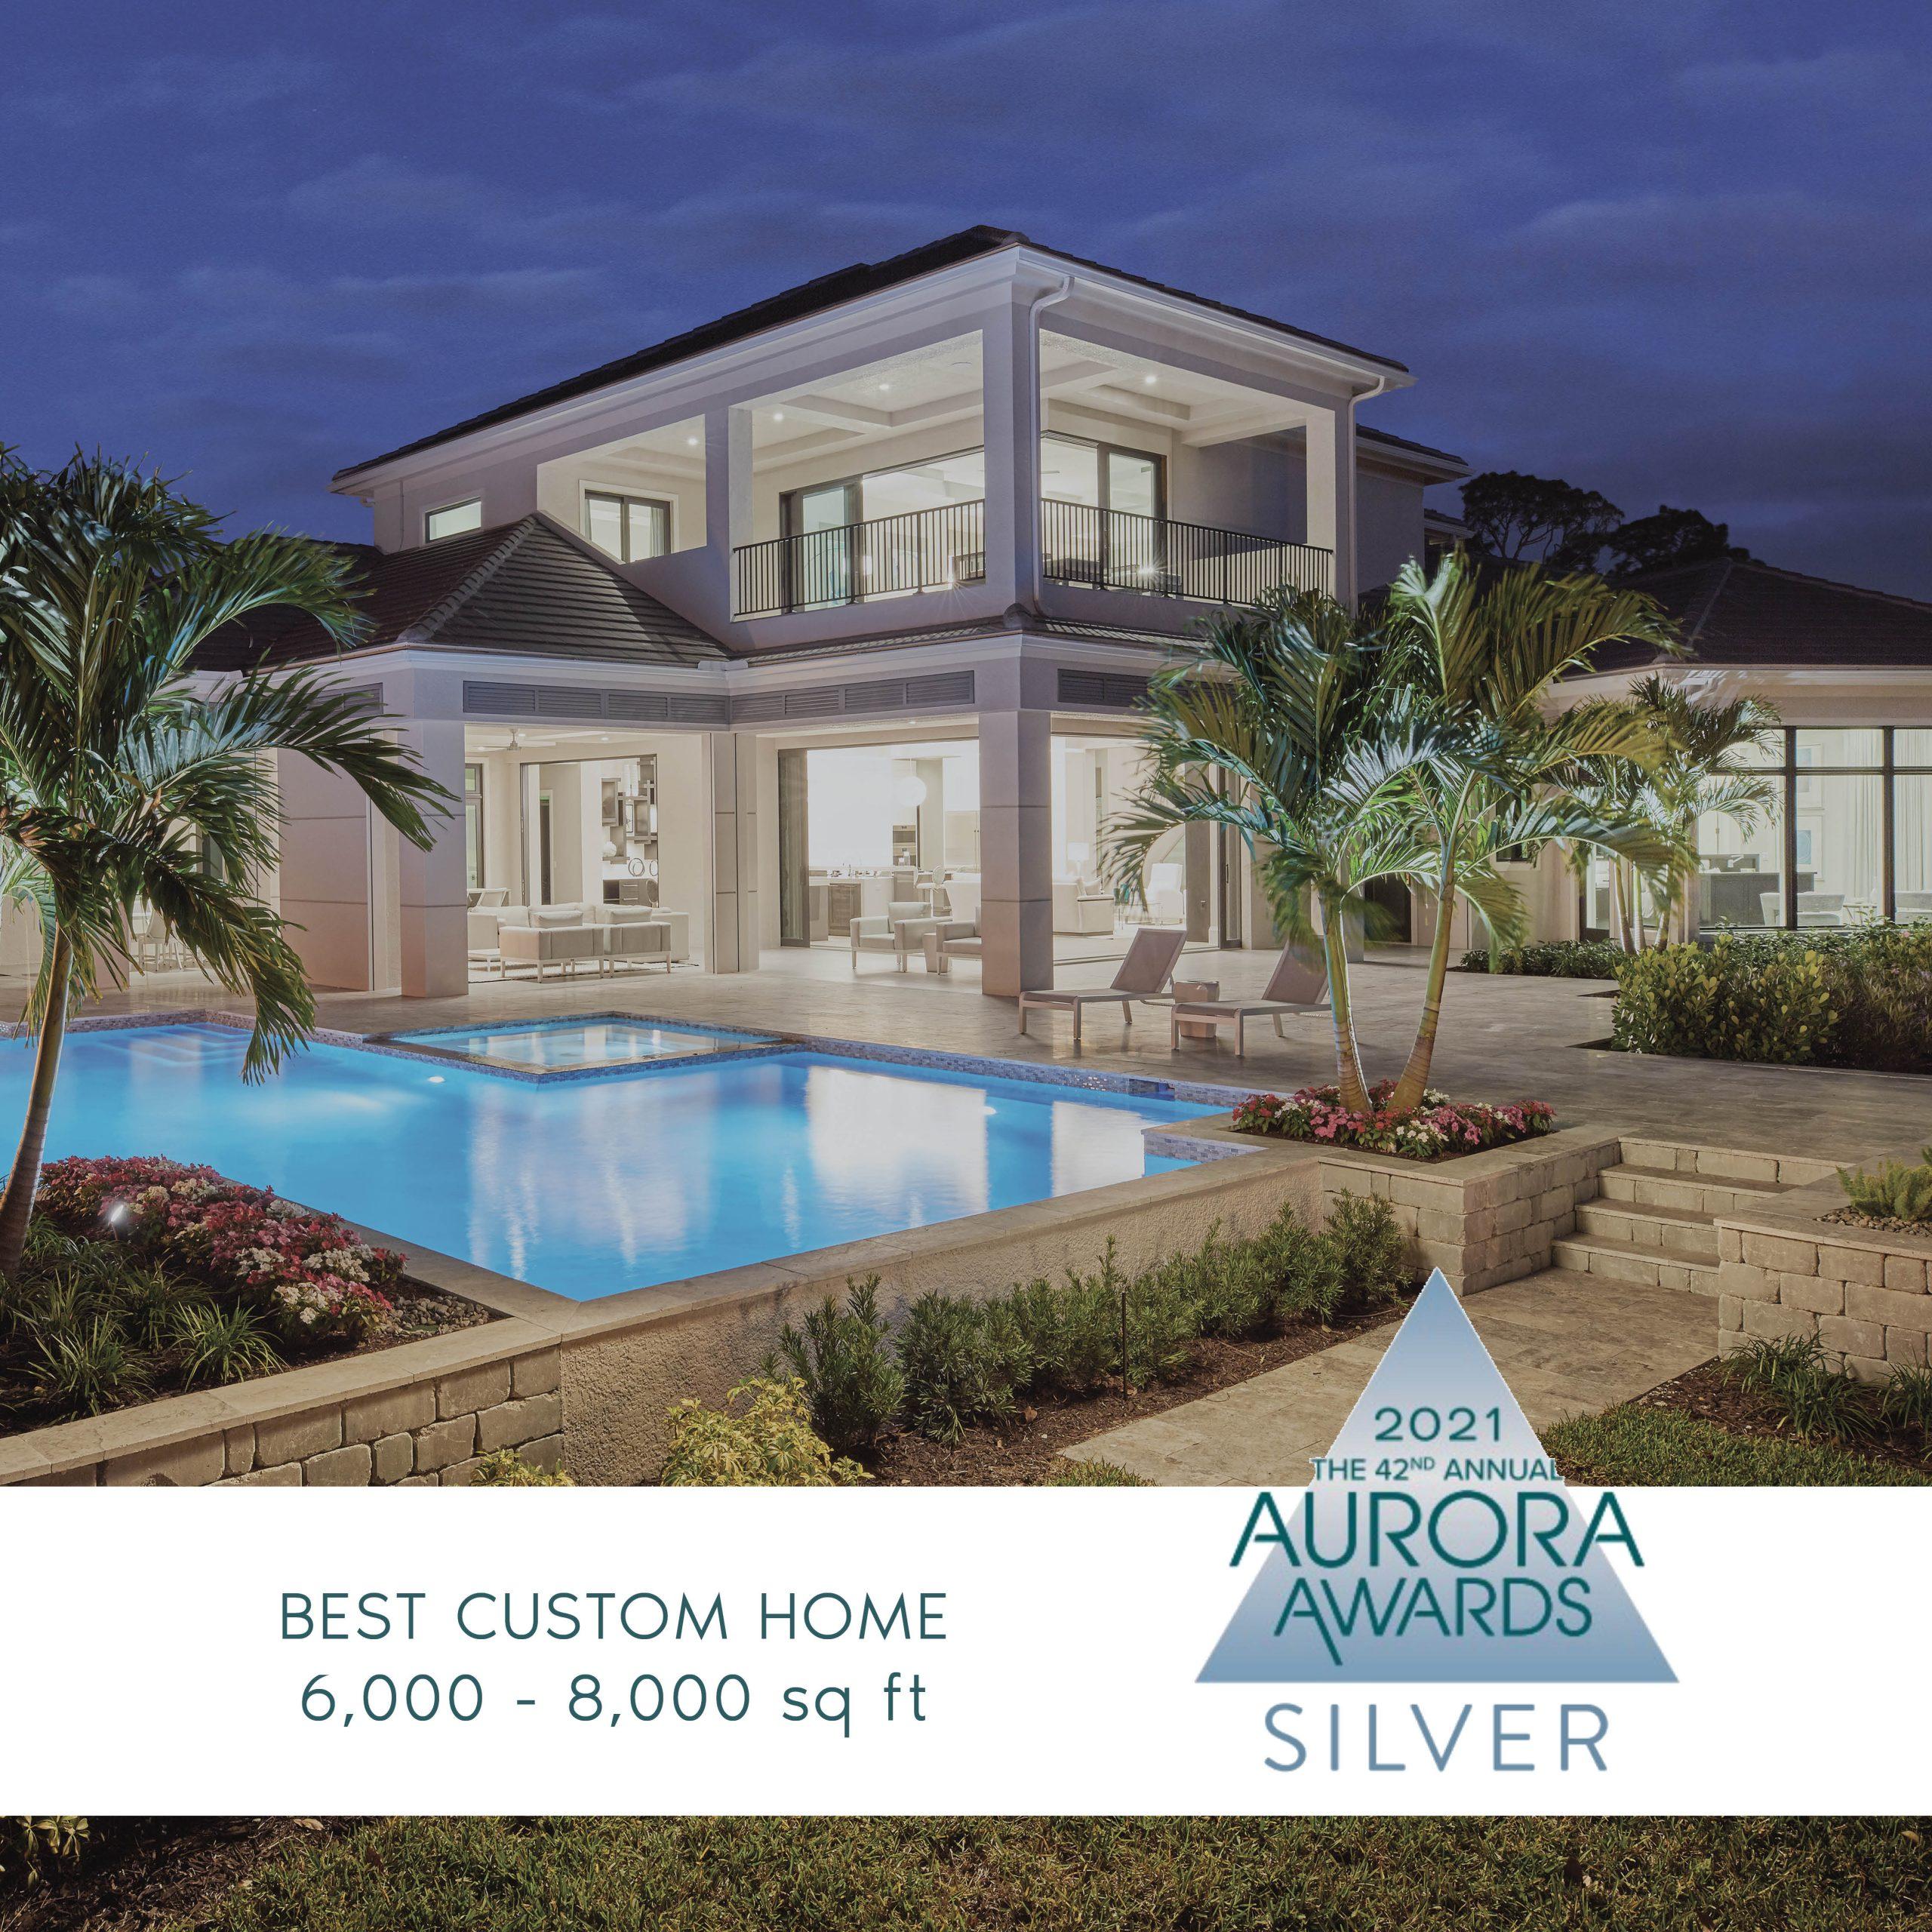 2021 Silver Aurora Award Winner